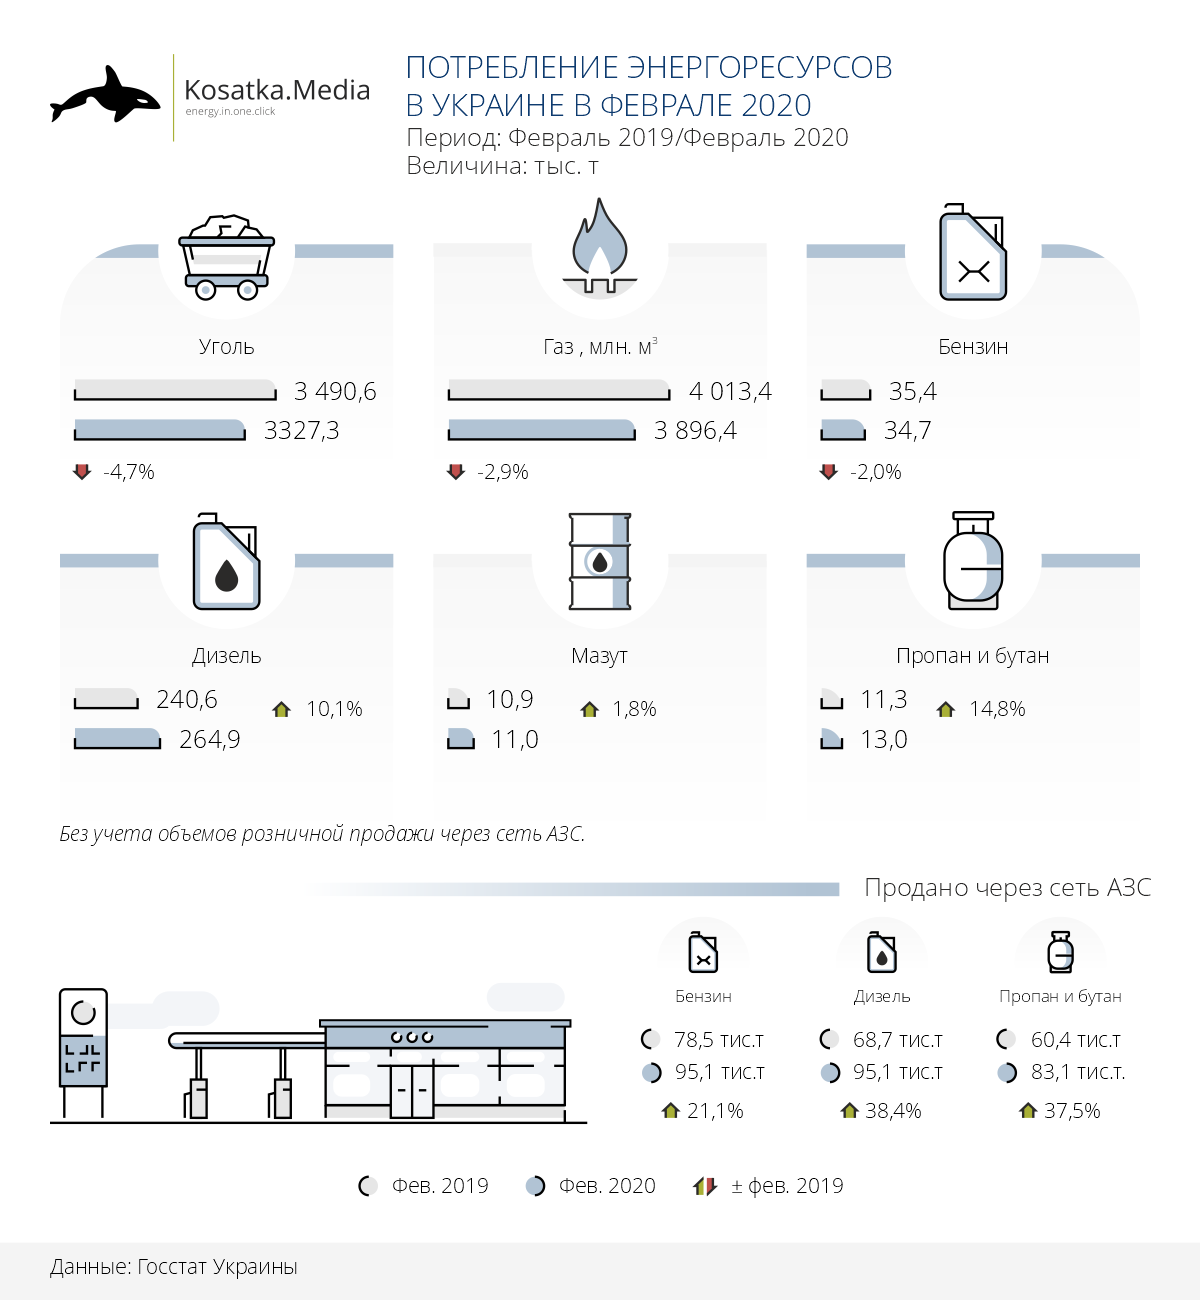 Energy consumption in Ukraine in February 2020